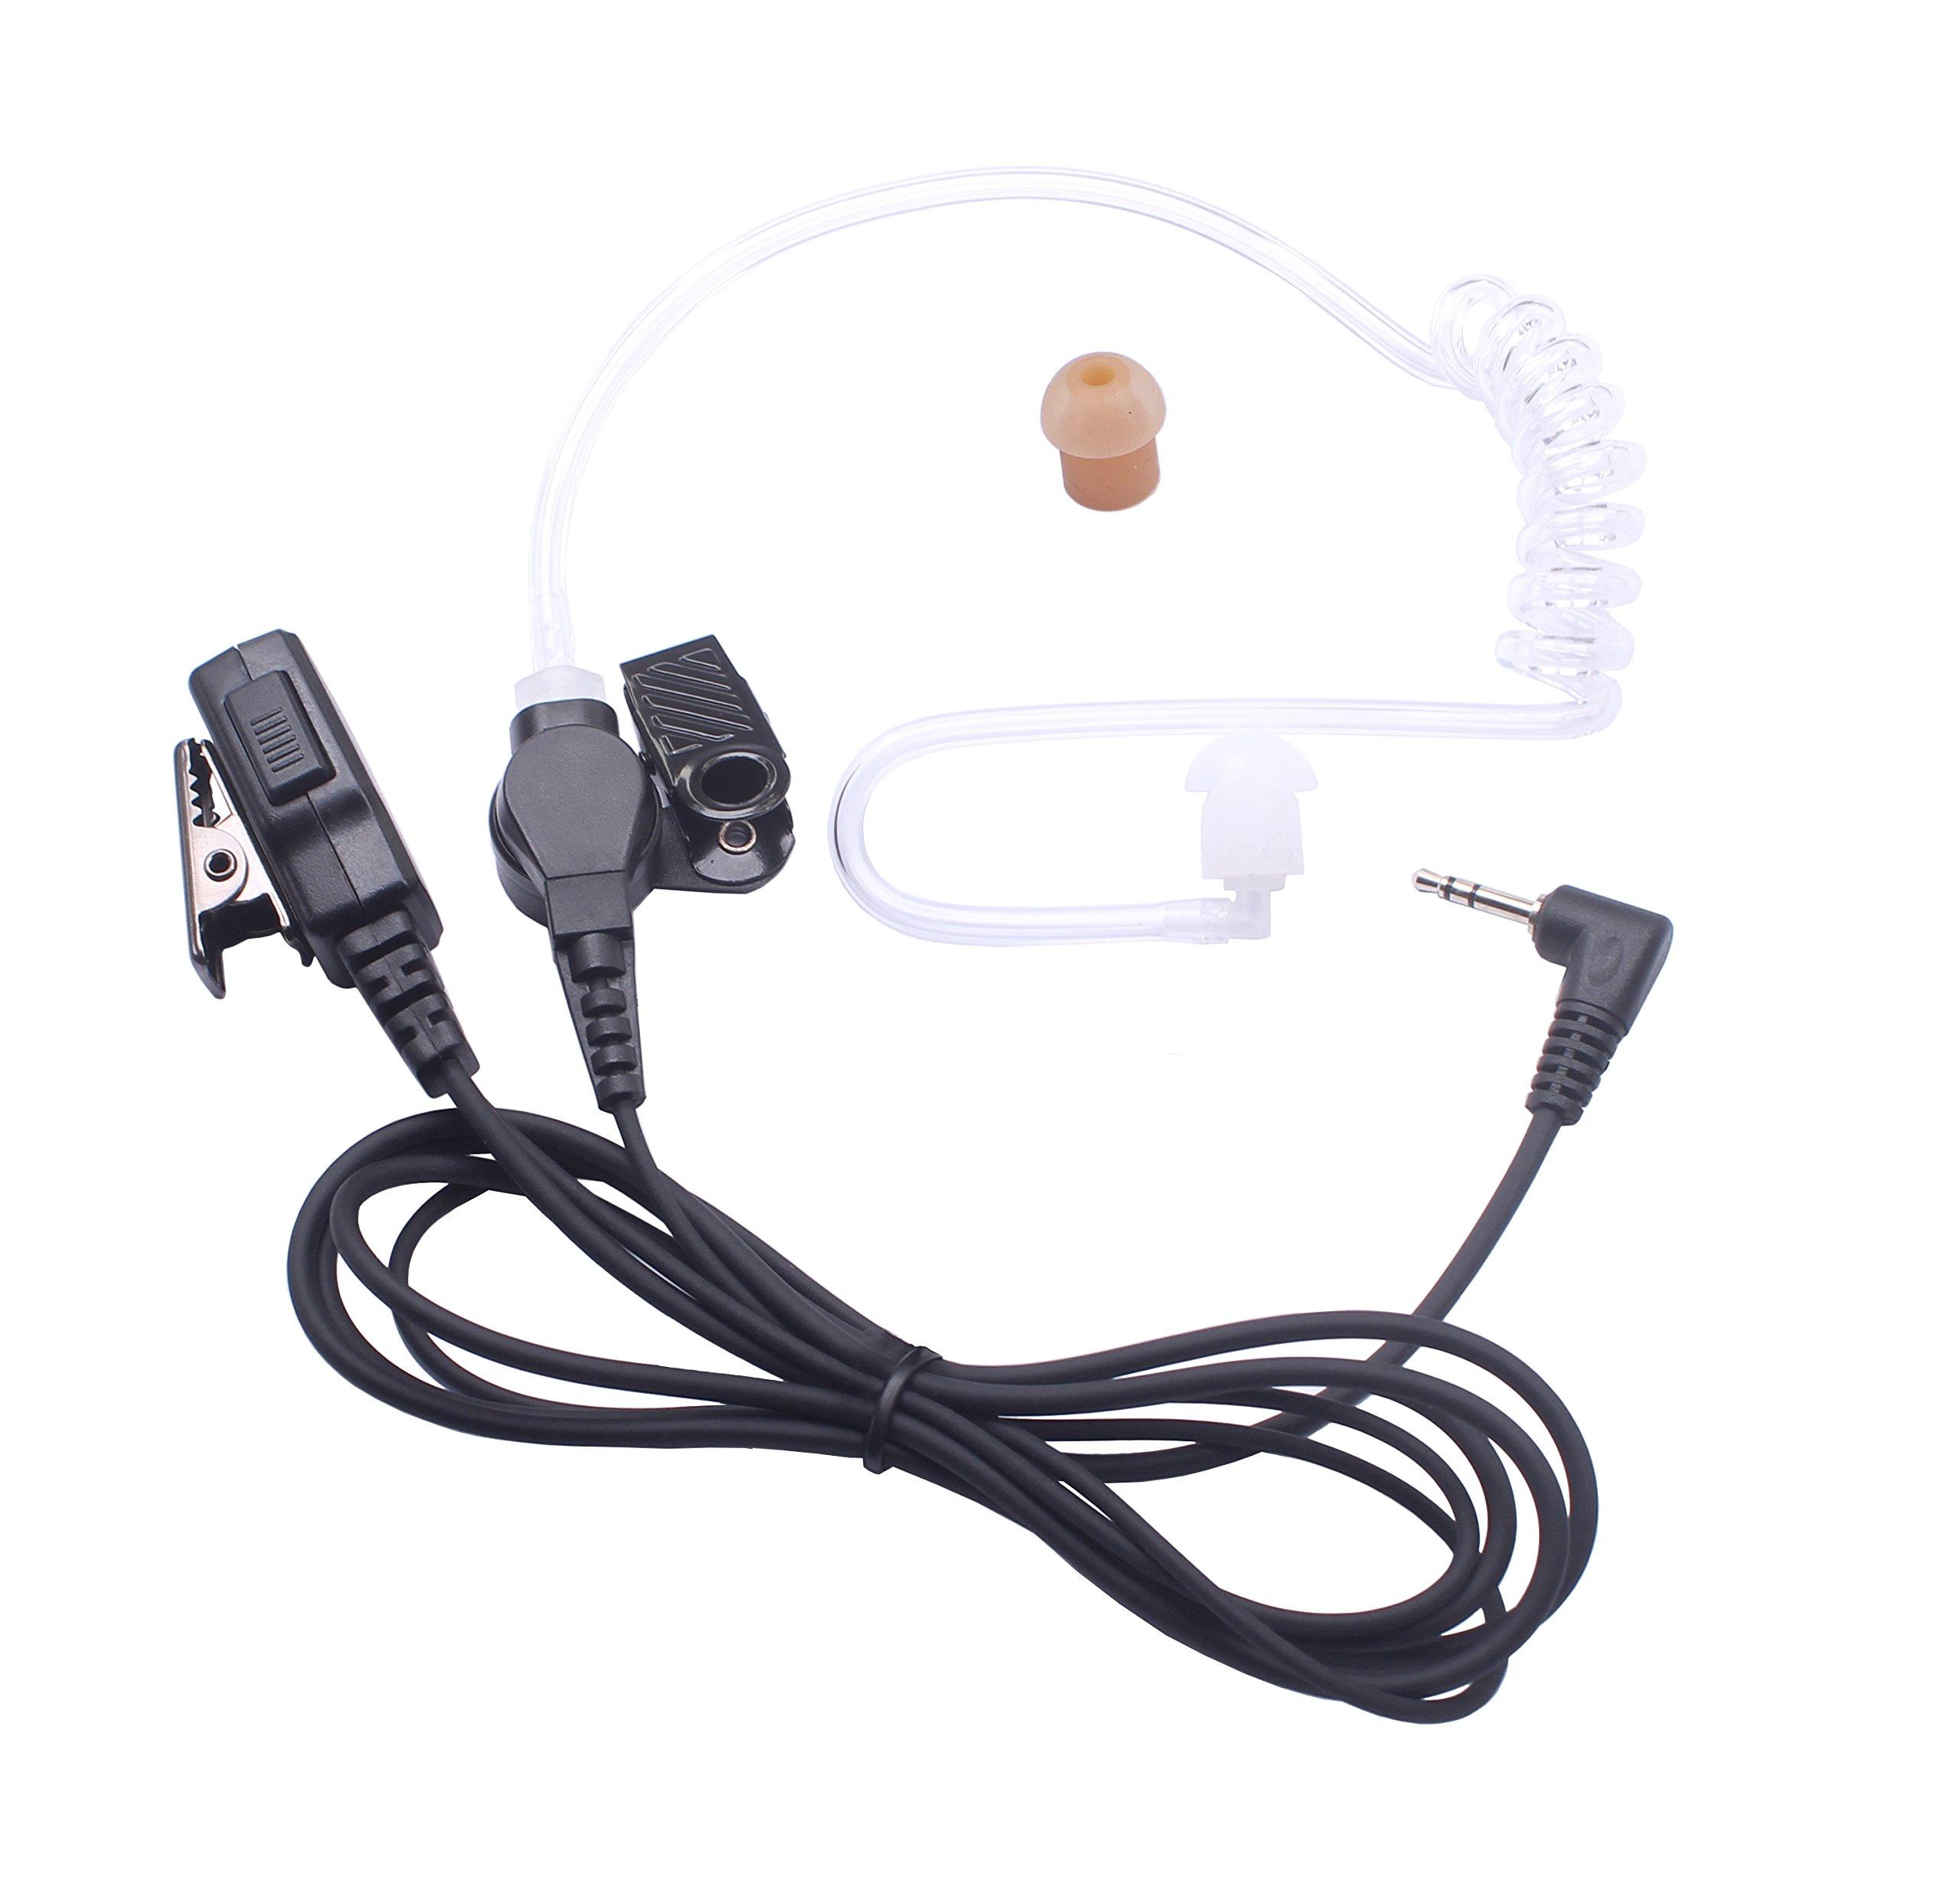 Bingle 1 Pin Covert Acoustic Tube Earpiece Surveillance Headset with PTT & Mic for Motorola Two Way Radio Walkie Talkies(MRT-M2)